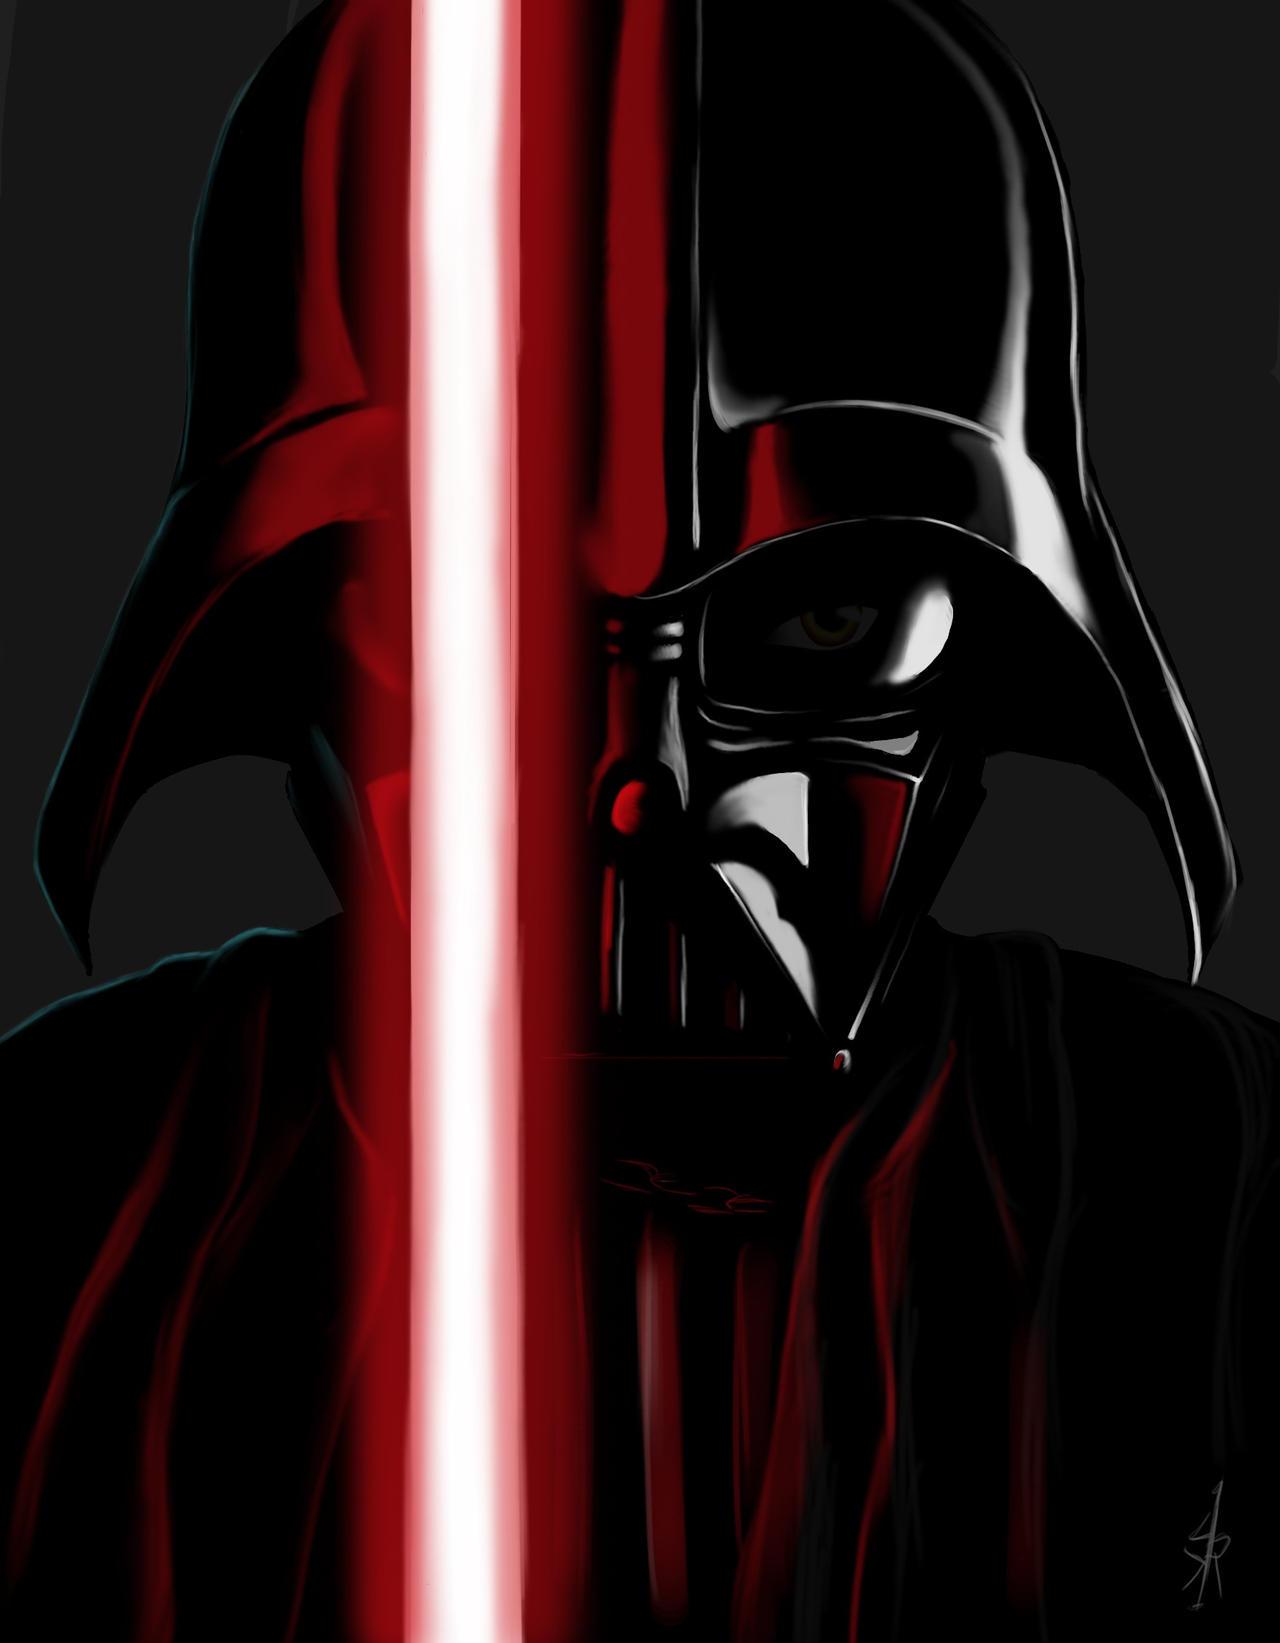 Darth Vader By Montano Fausto On Deviantart